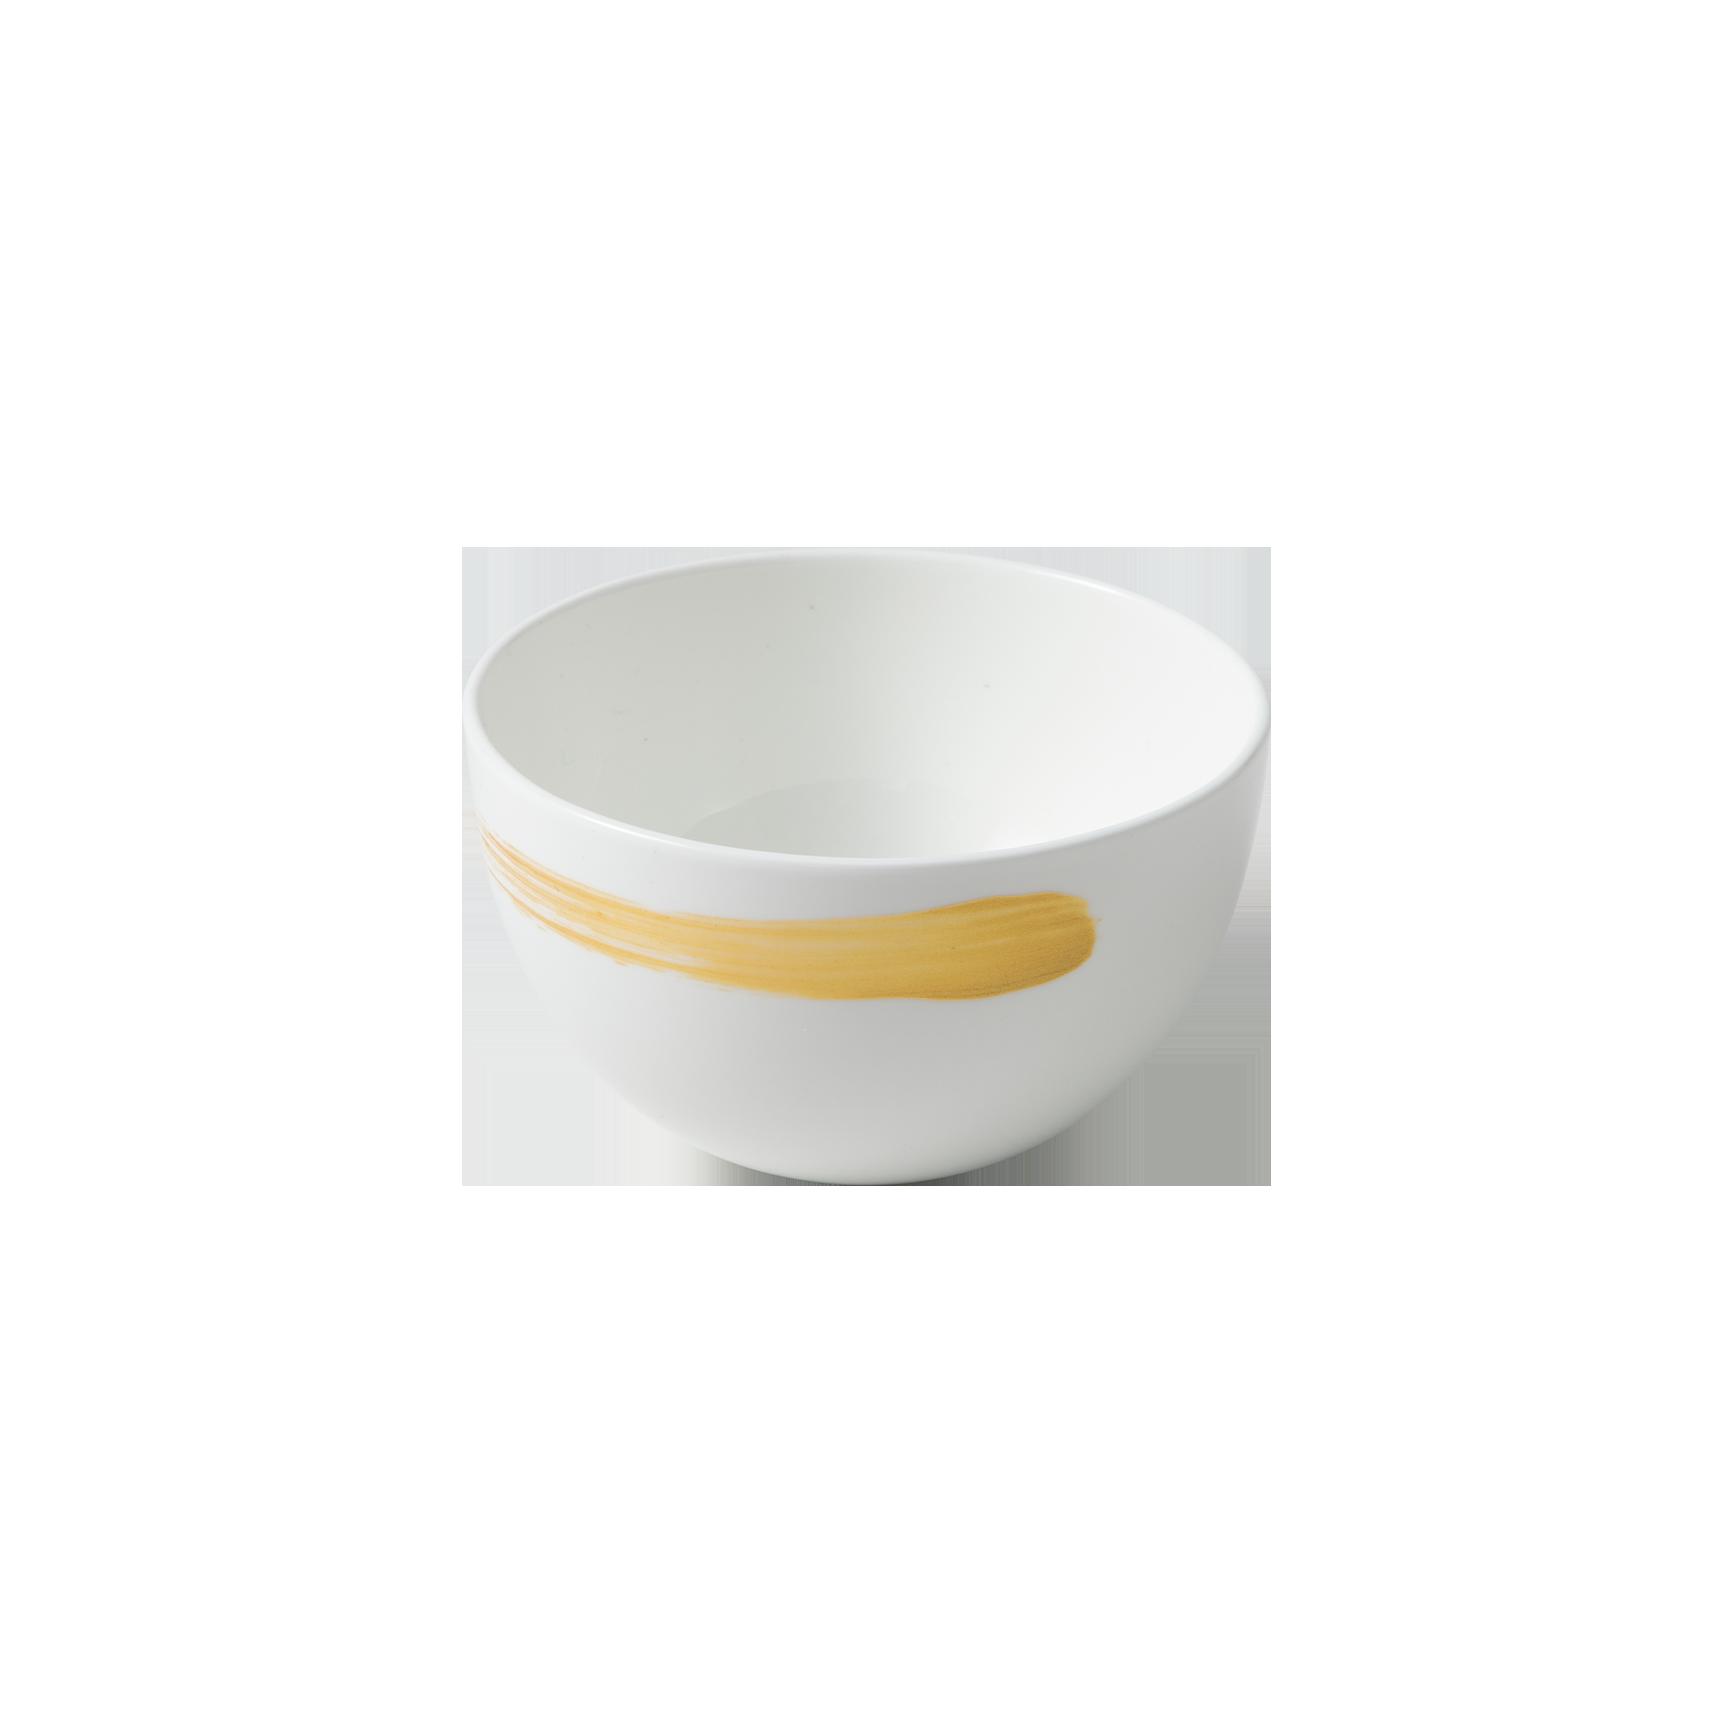 Ball Shape Bowl